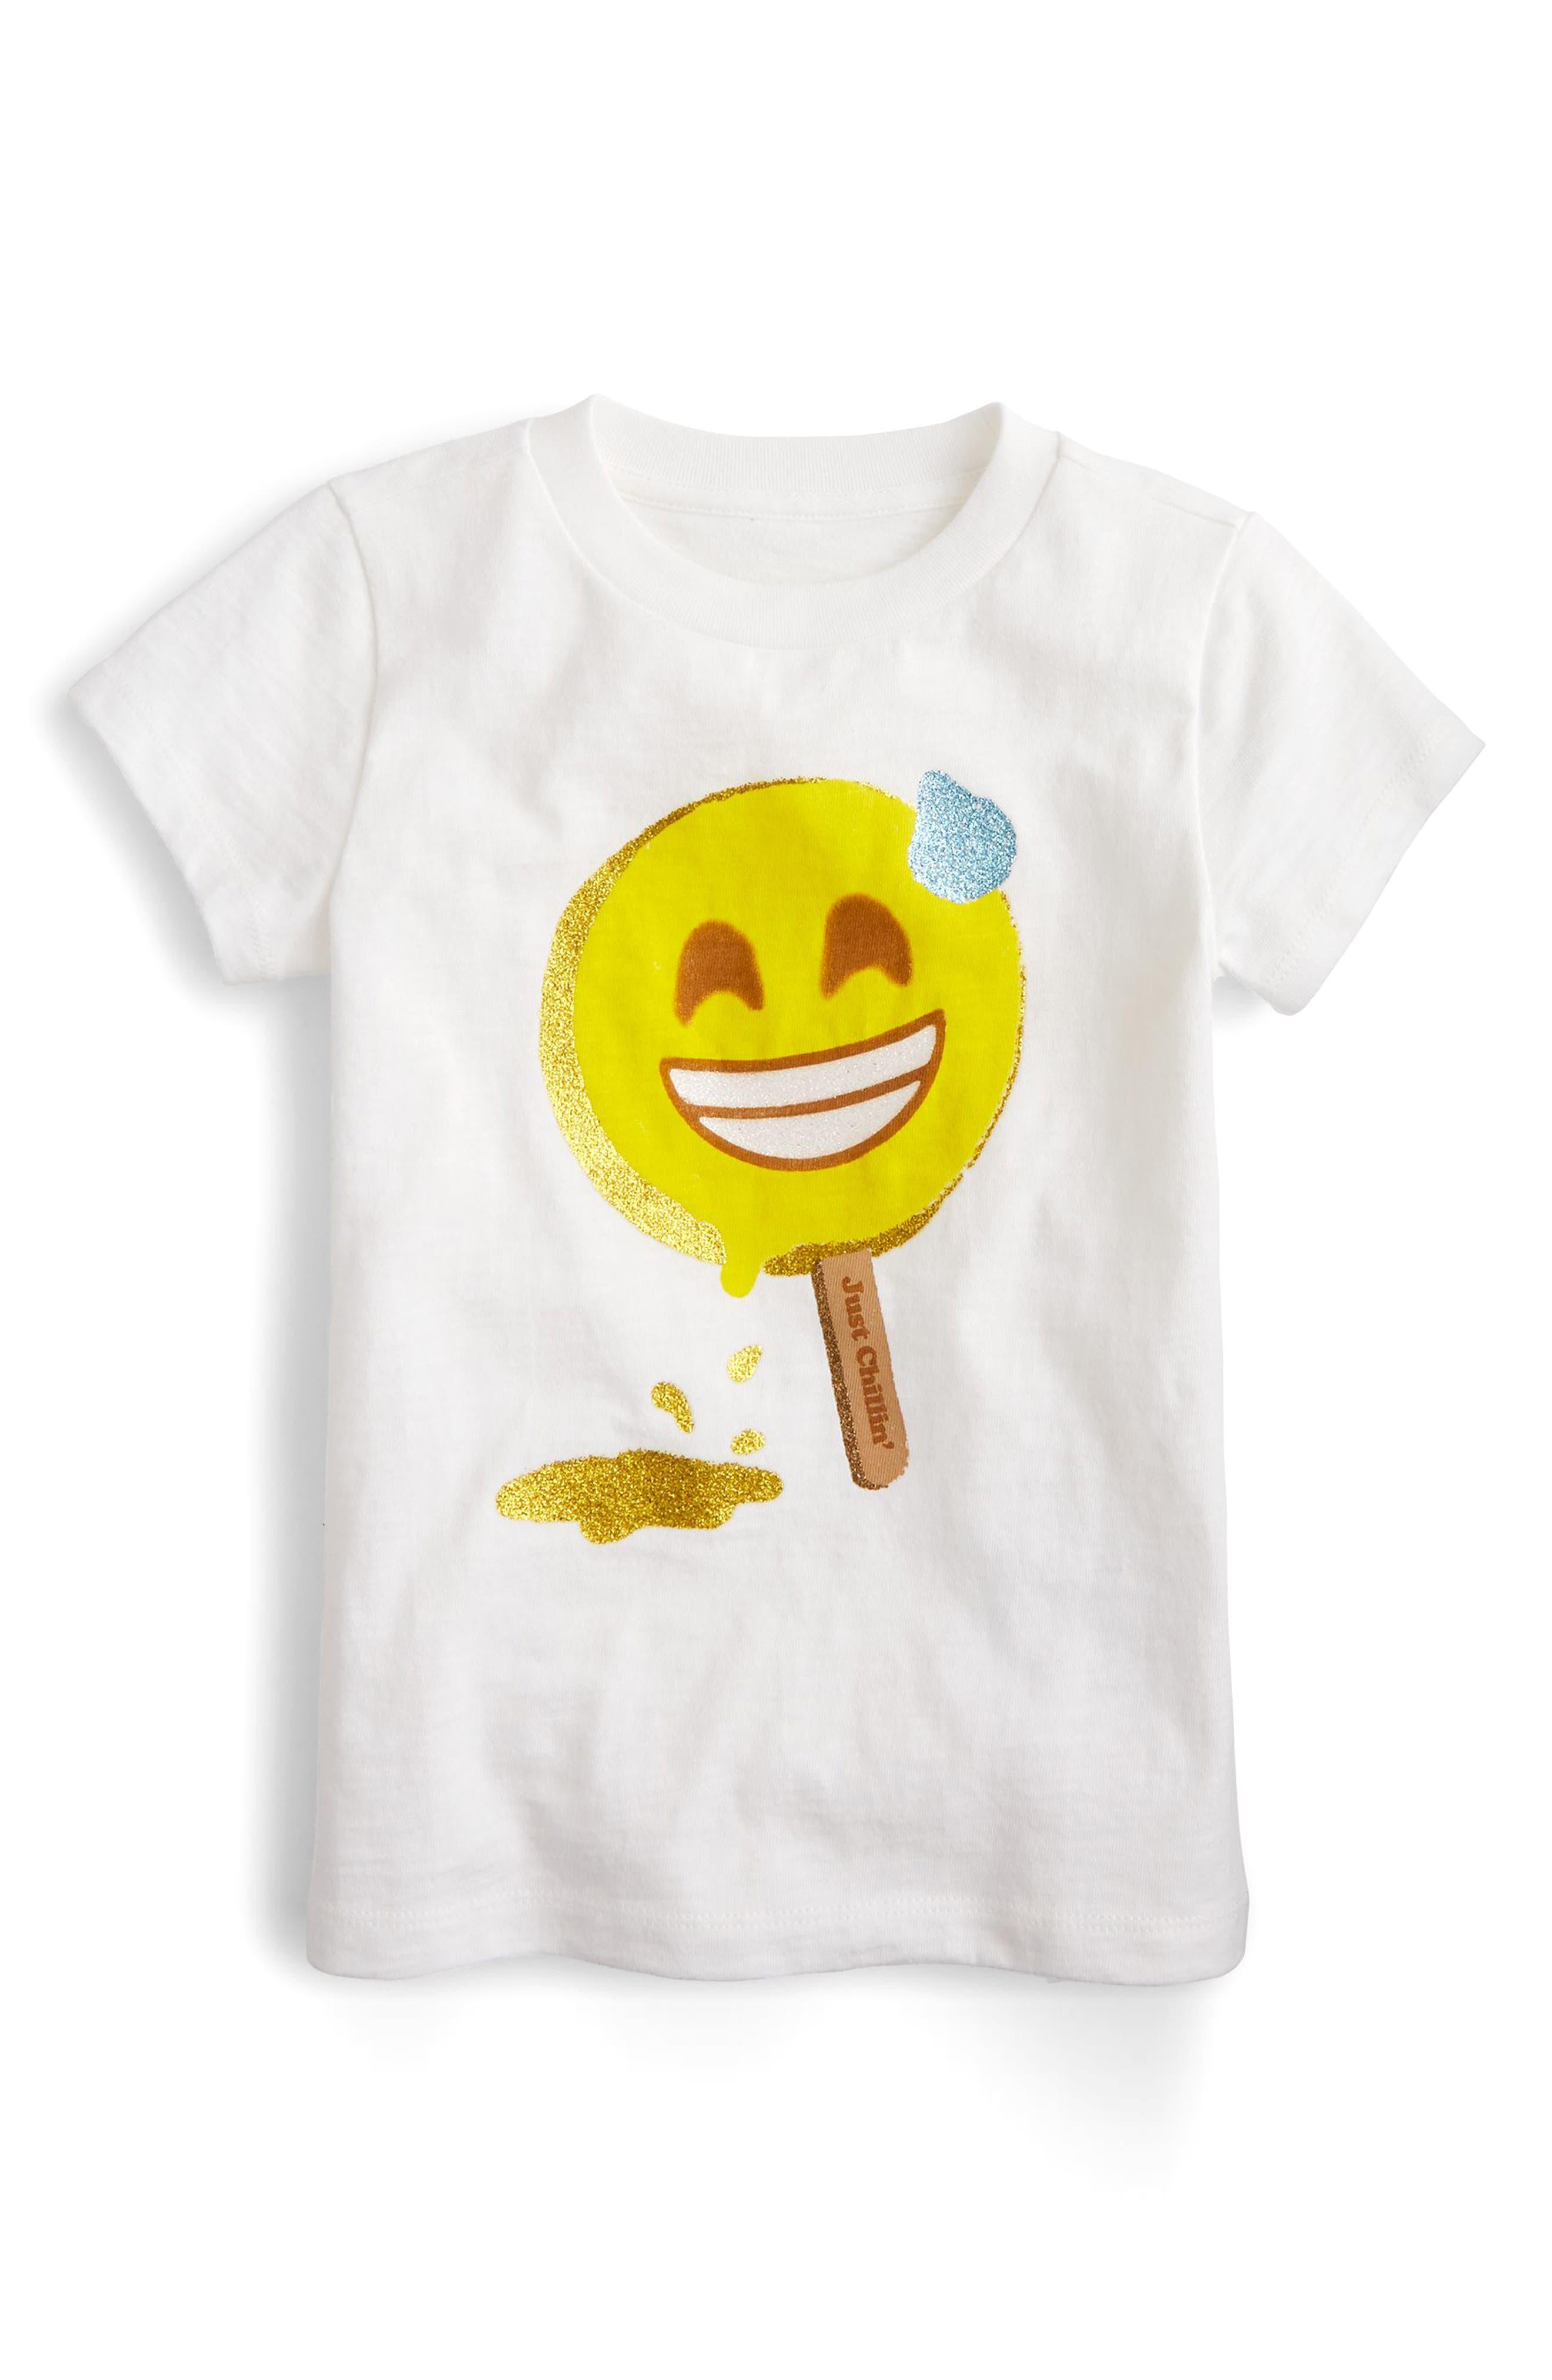 crewcuts by J. Crew Chill Emoji Tee (Toddler Girls, Little Girls & Big Girls)